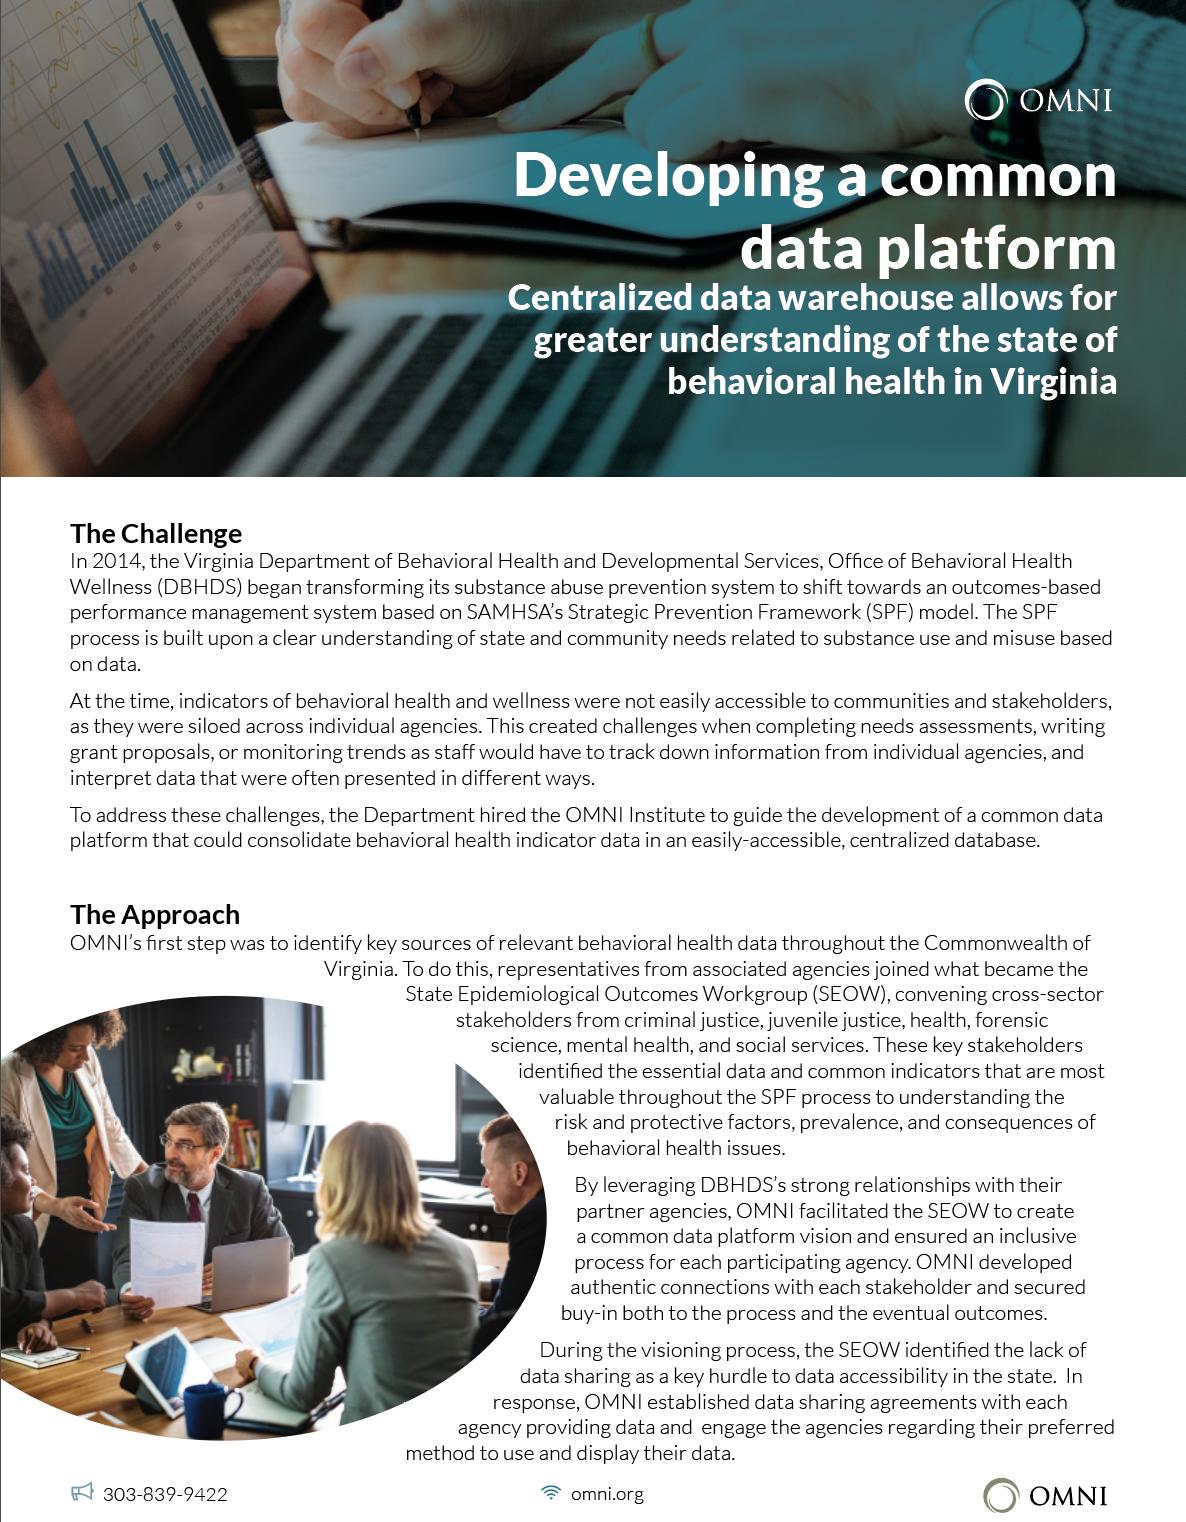 Data Platform case study